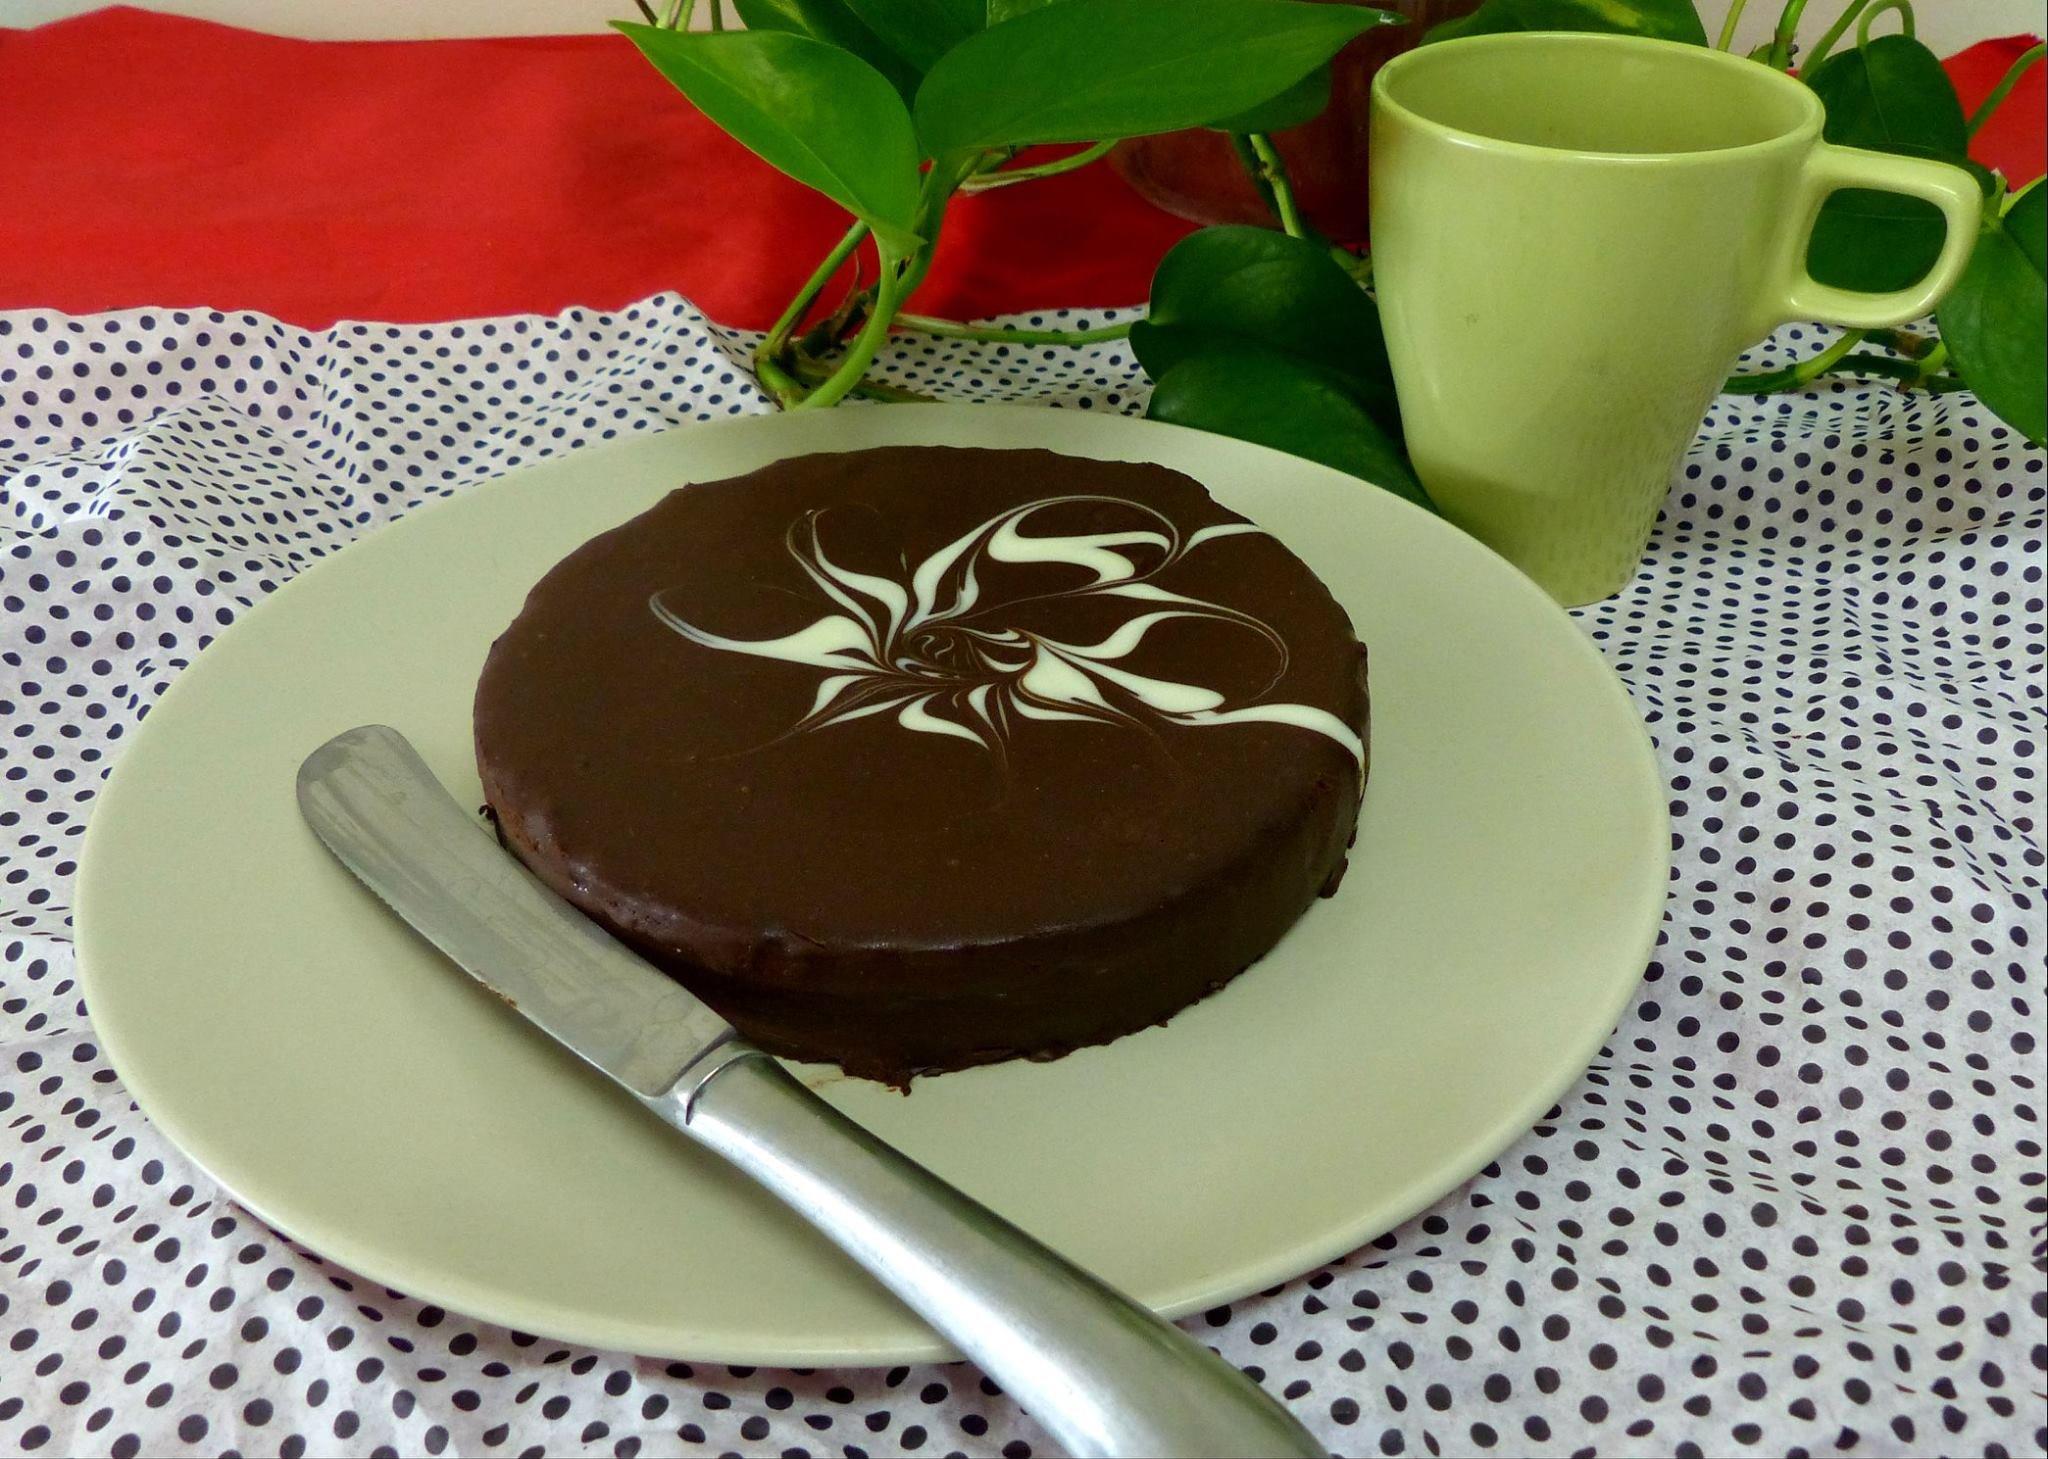 Flourless Chocolate Torte (Certified Gluten Free) by Gem City Fine Foods (Image #1)